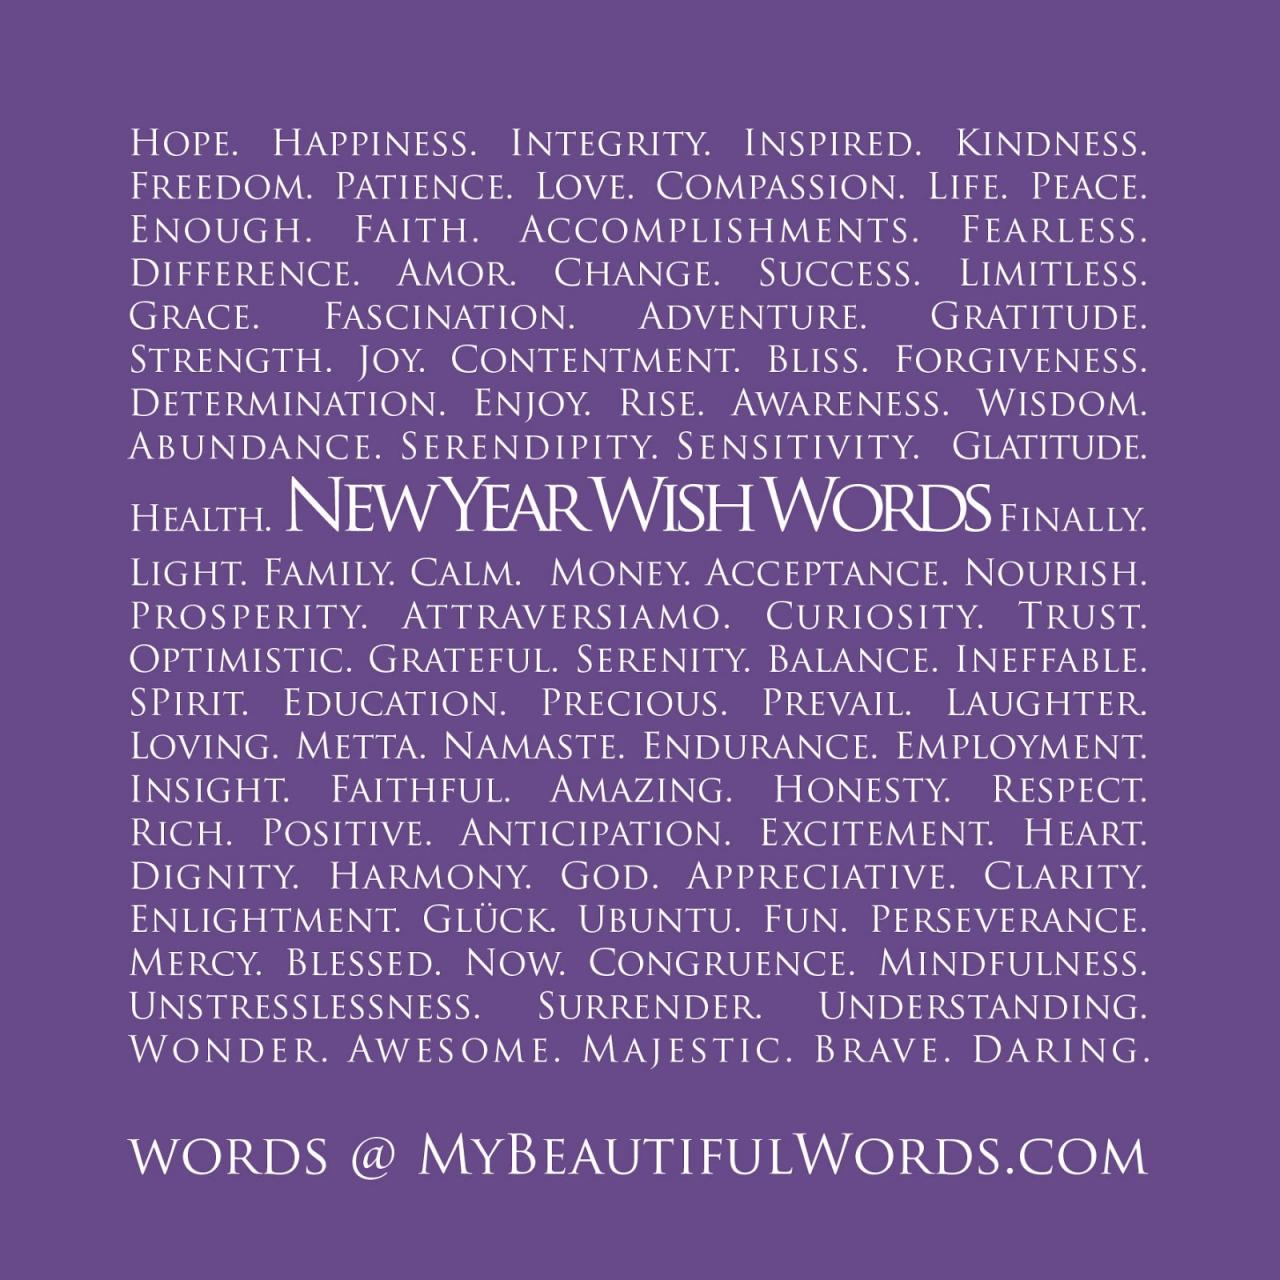 New Year Wish Words